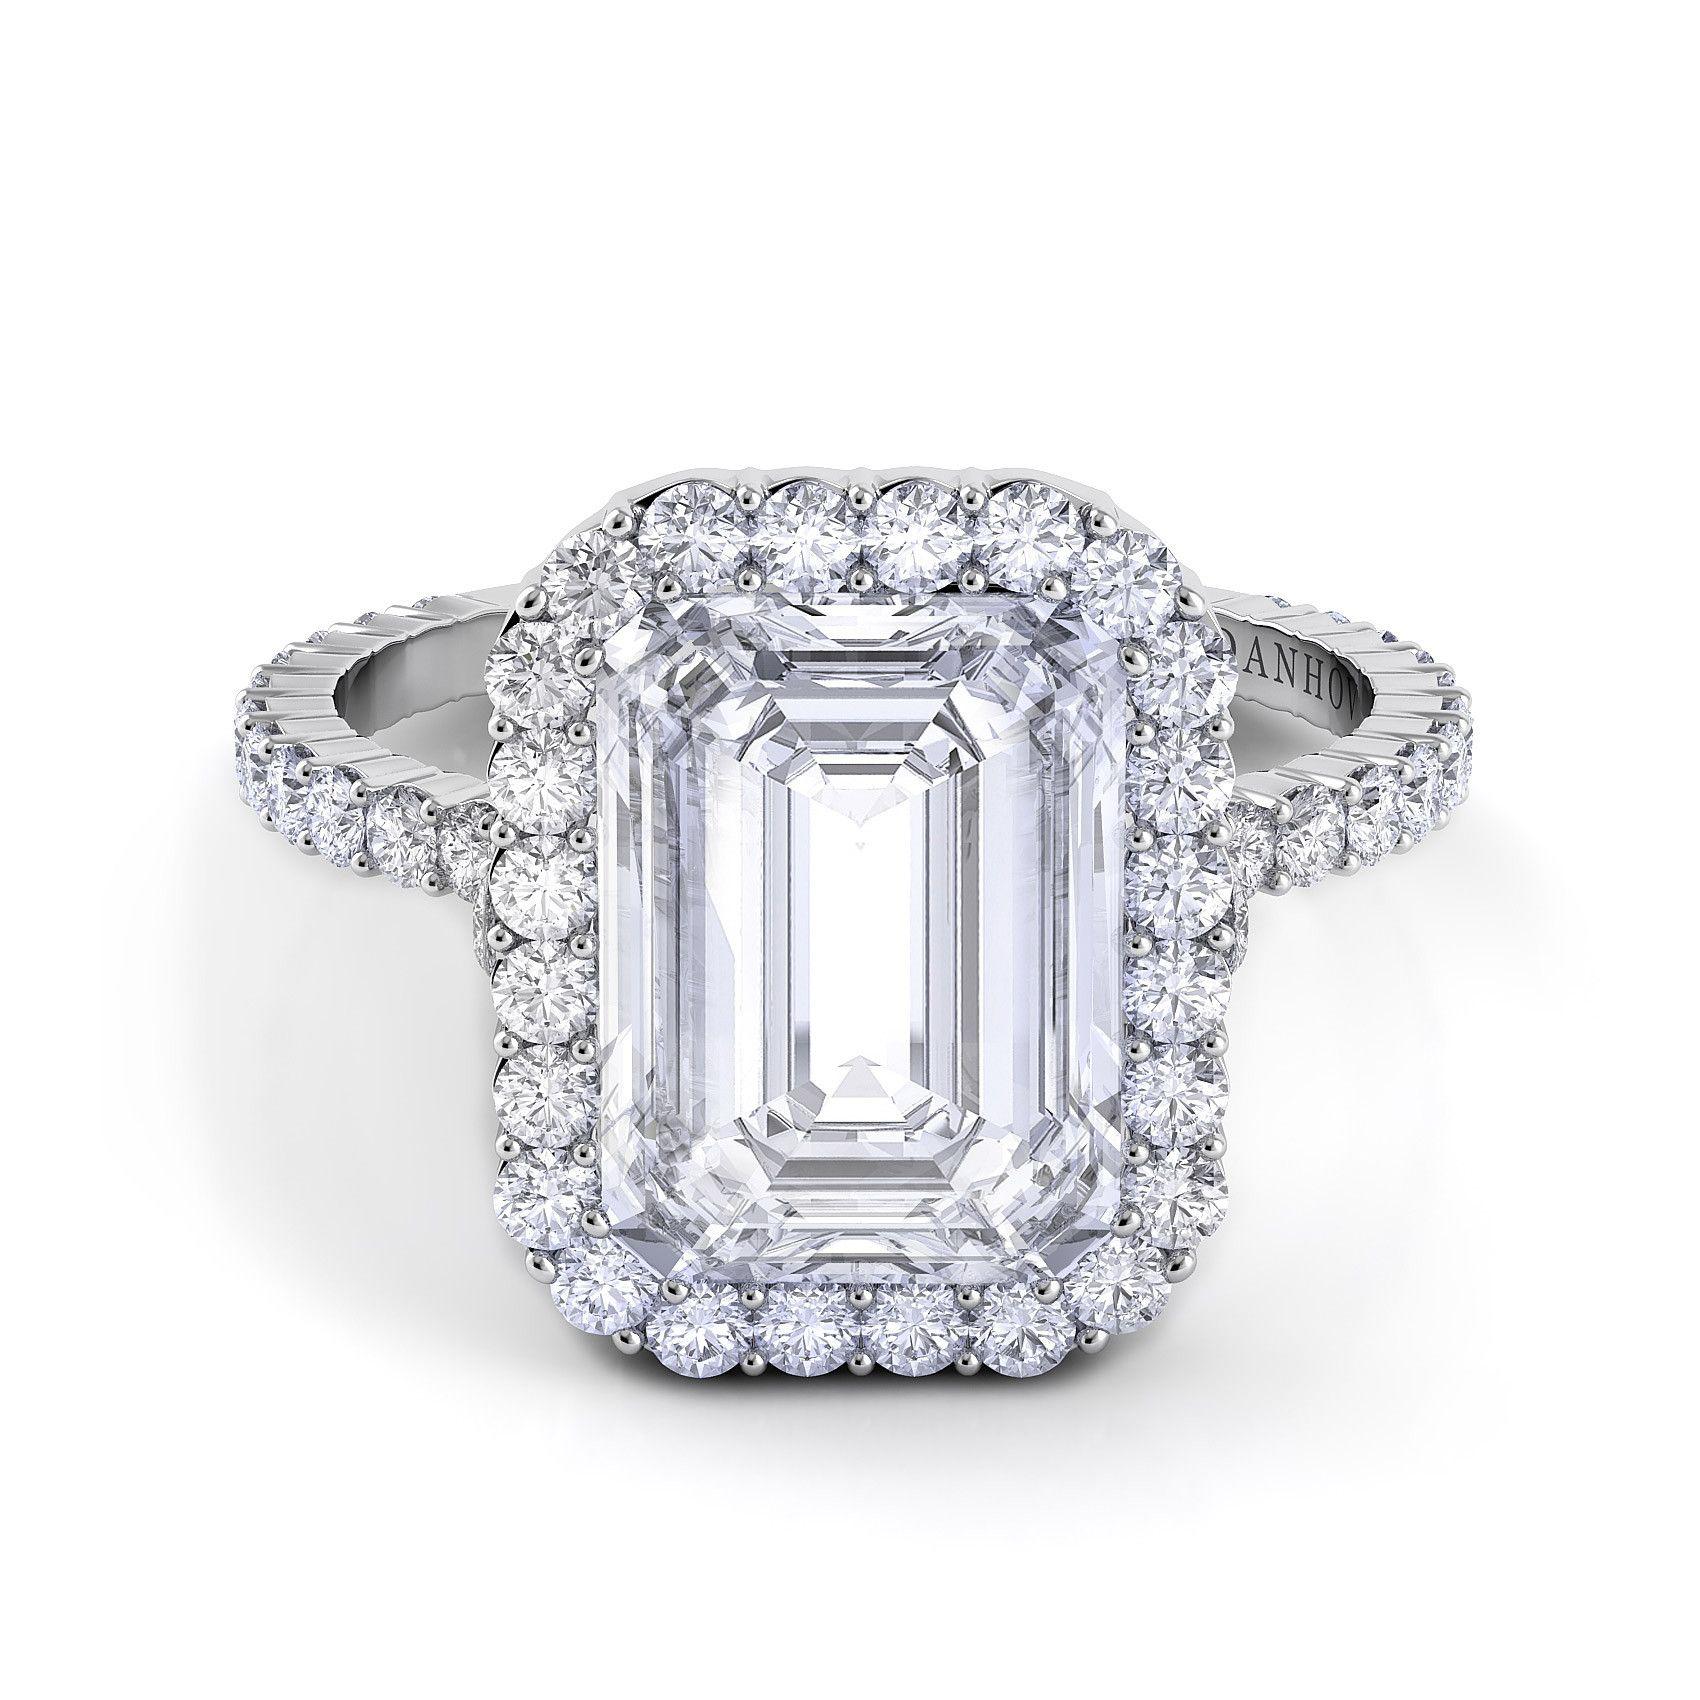 danhov carezza emerald cut diamond engagement ring with halo